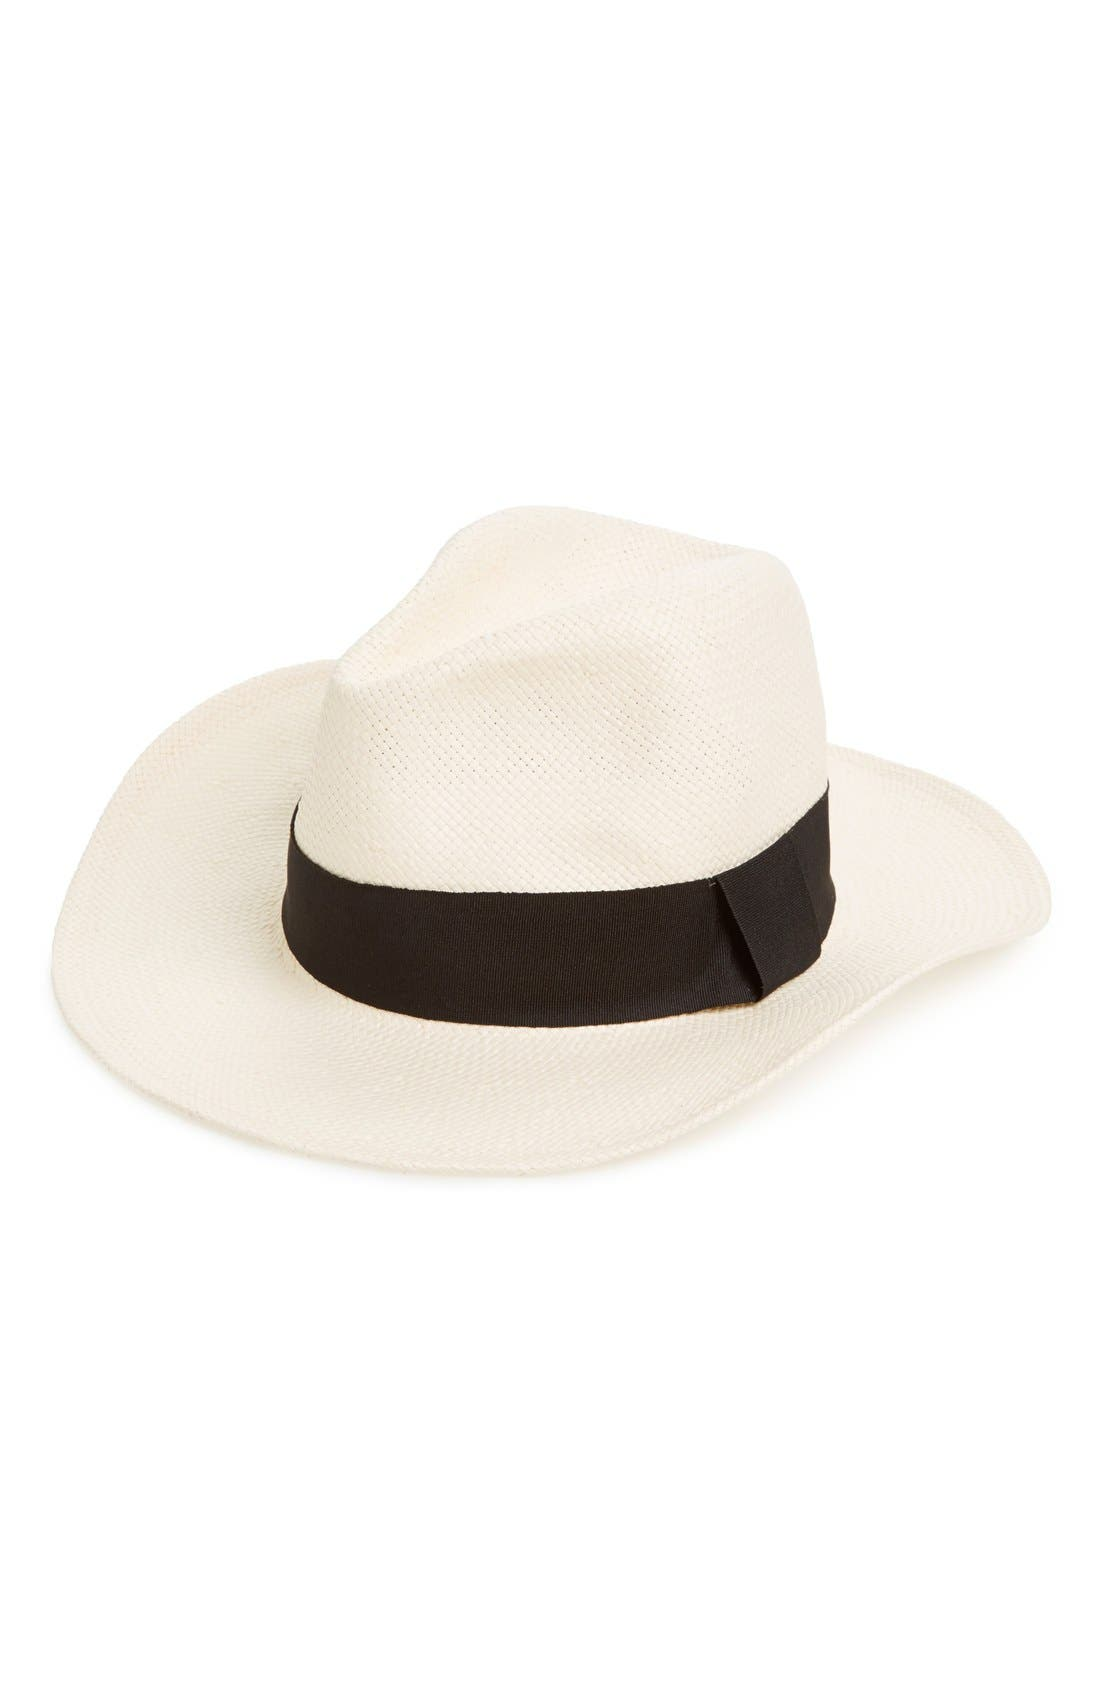 Main Image - Michael Stars 'Well Weathered' Straw Panama Hat